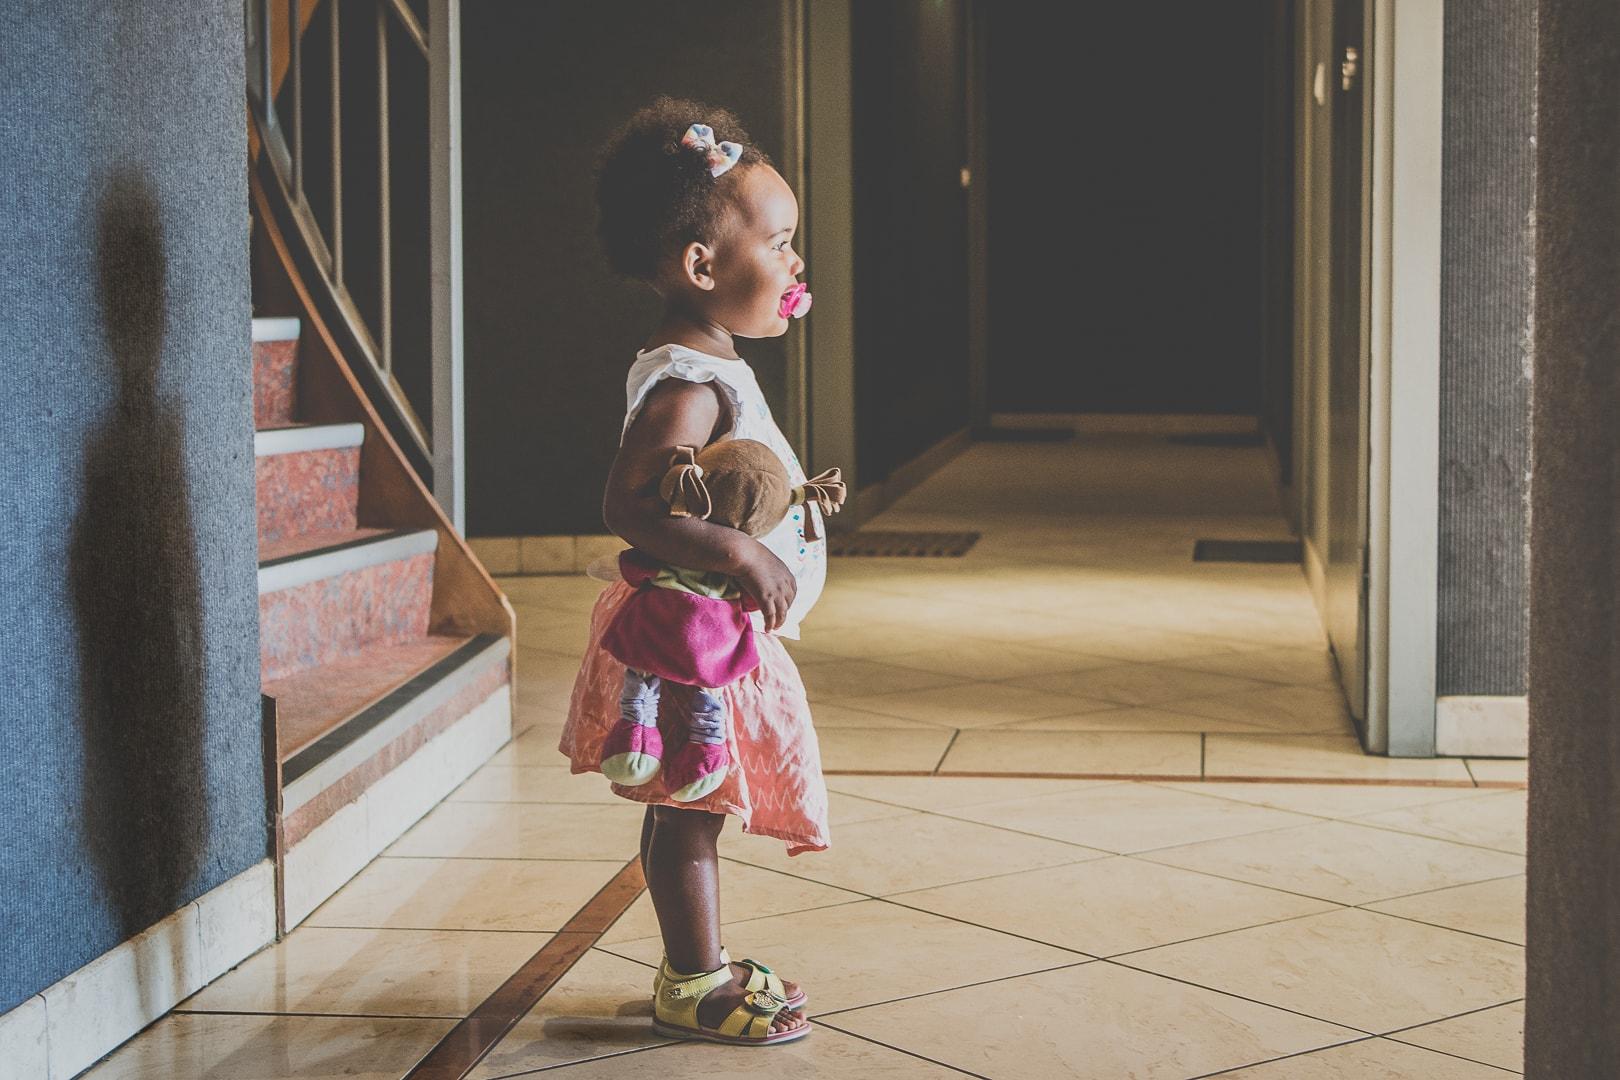 trezors-photography-photographe-professionnel-toulouse-31-enfance-seance-famille-lifestyle (5)